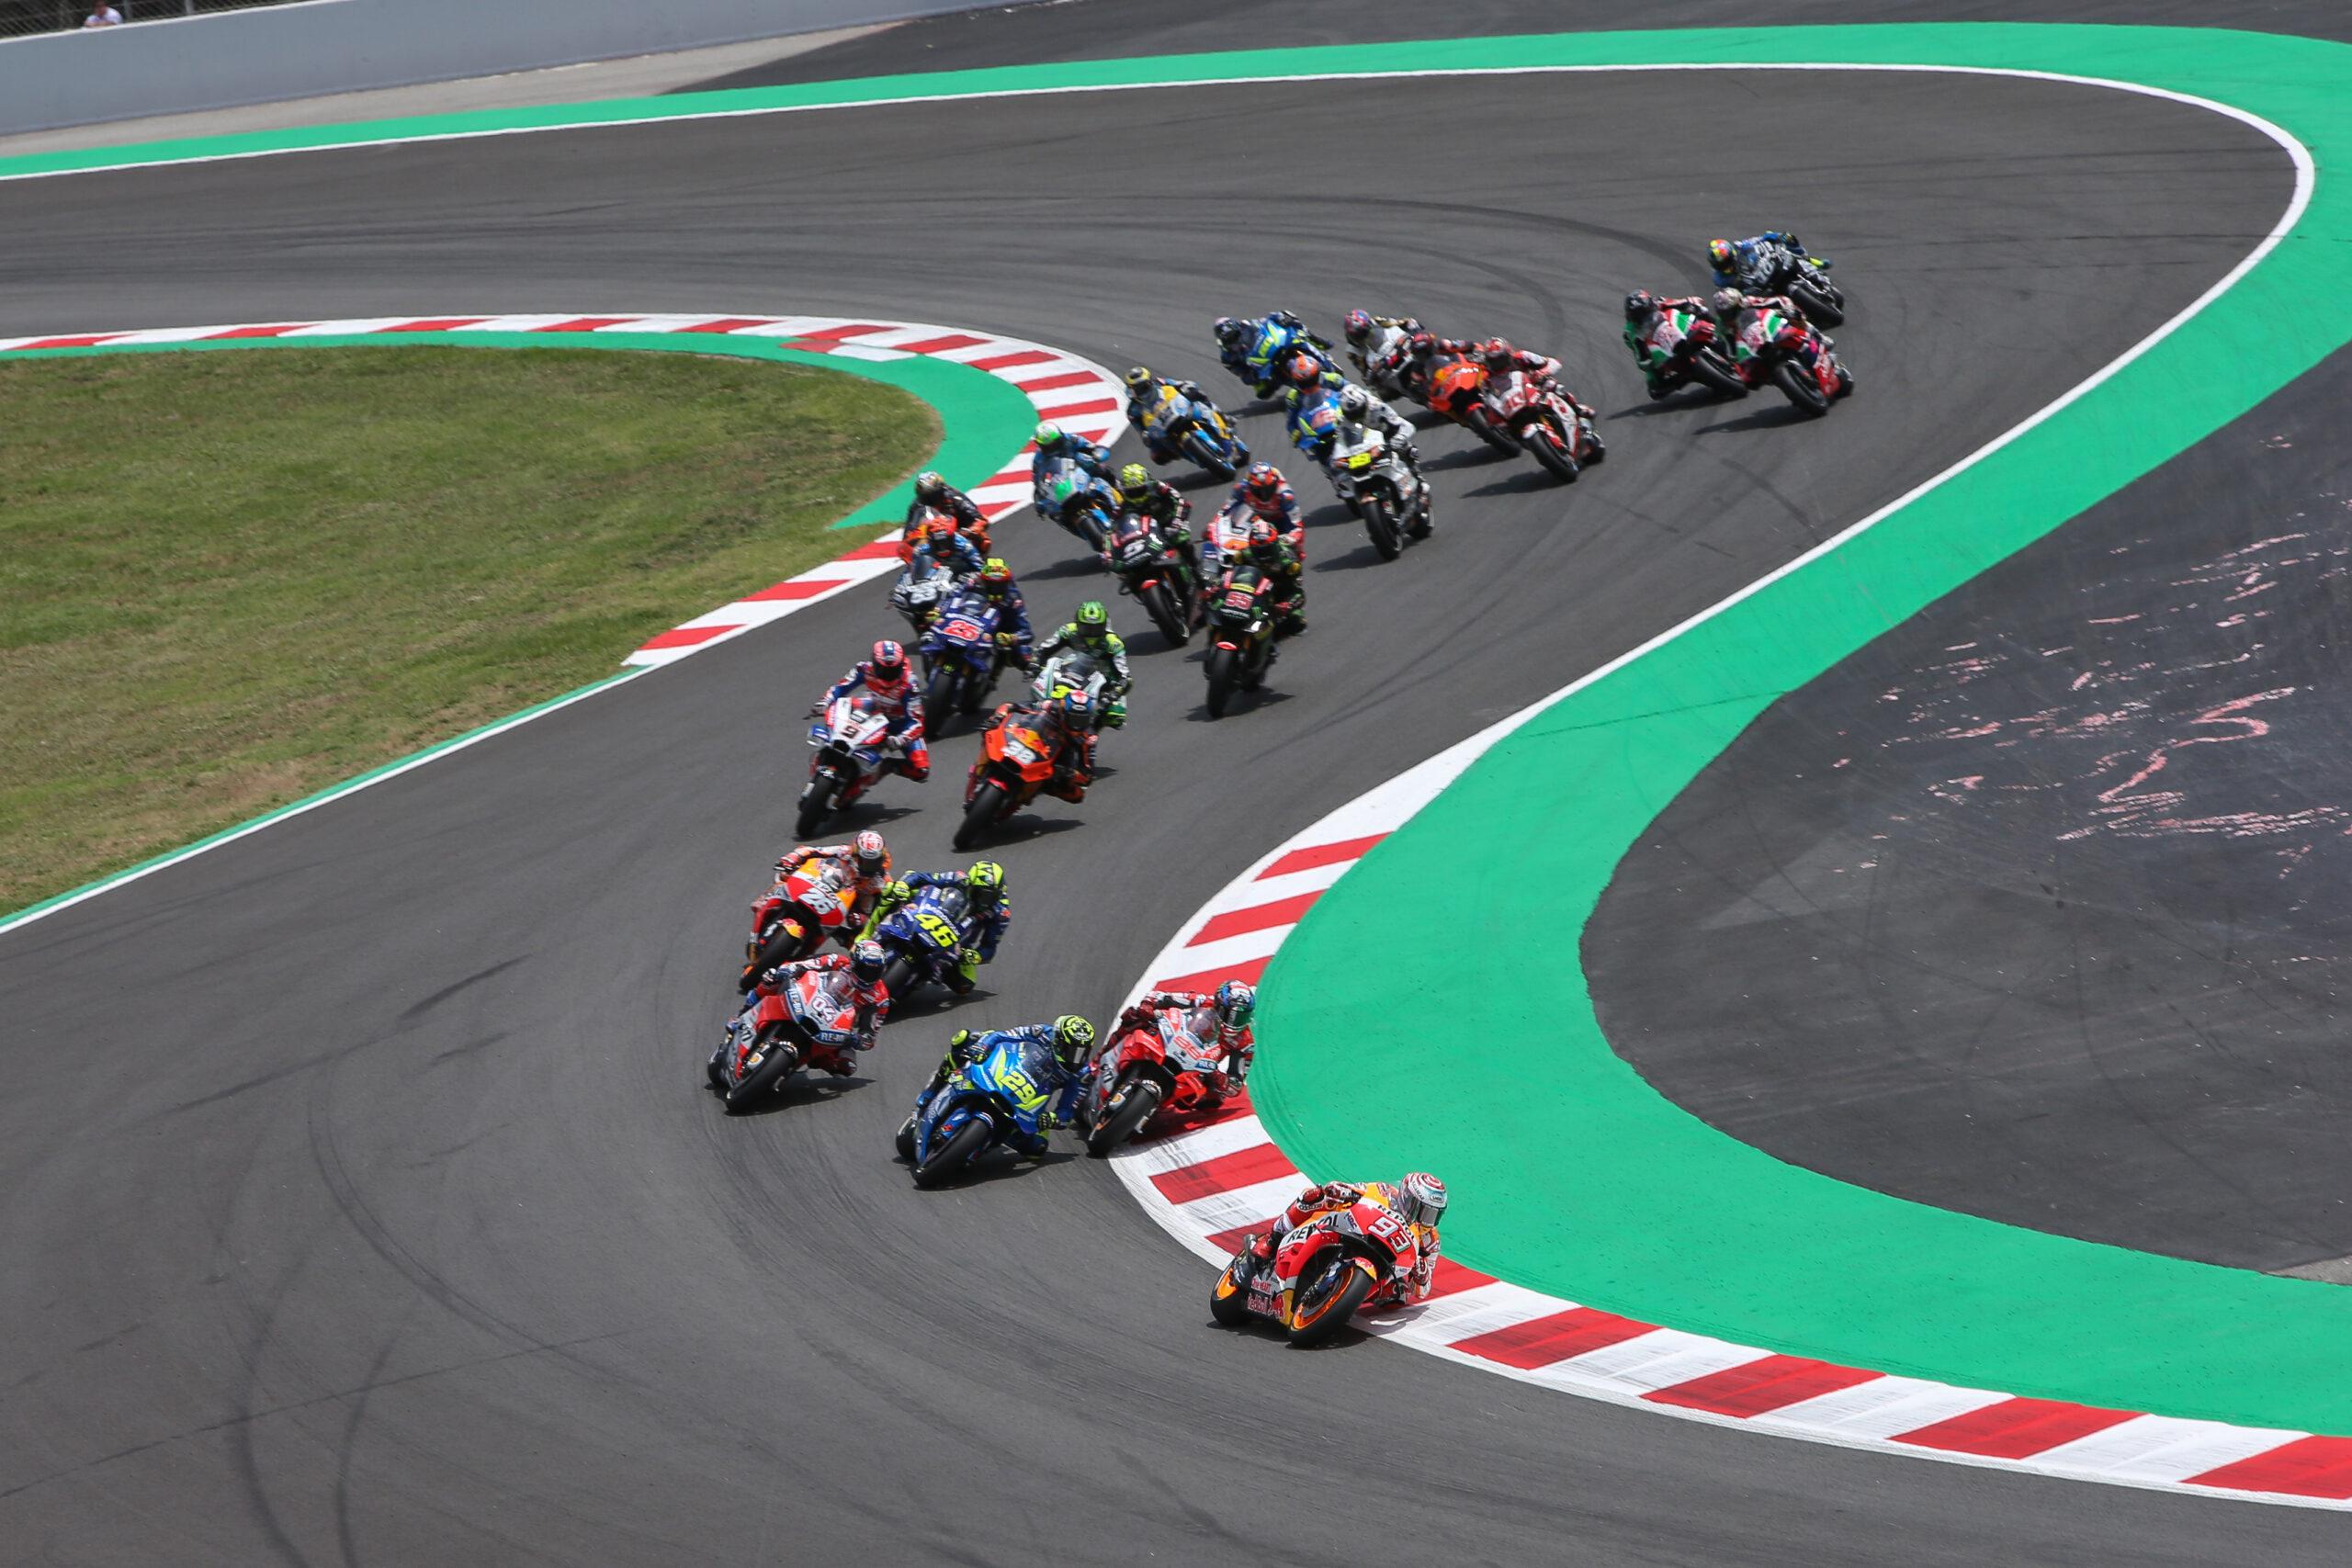 Catalan Grand Prix